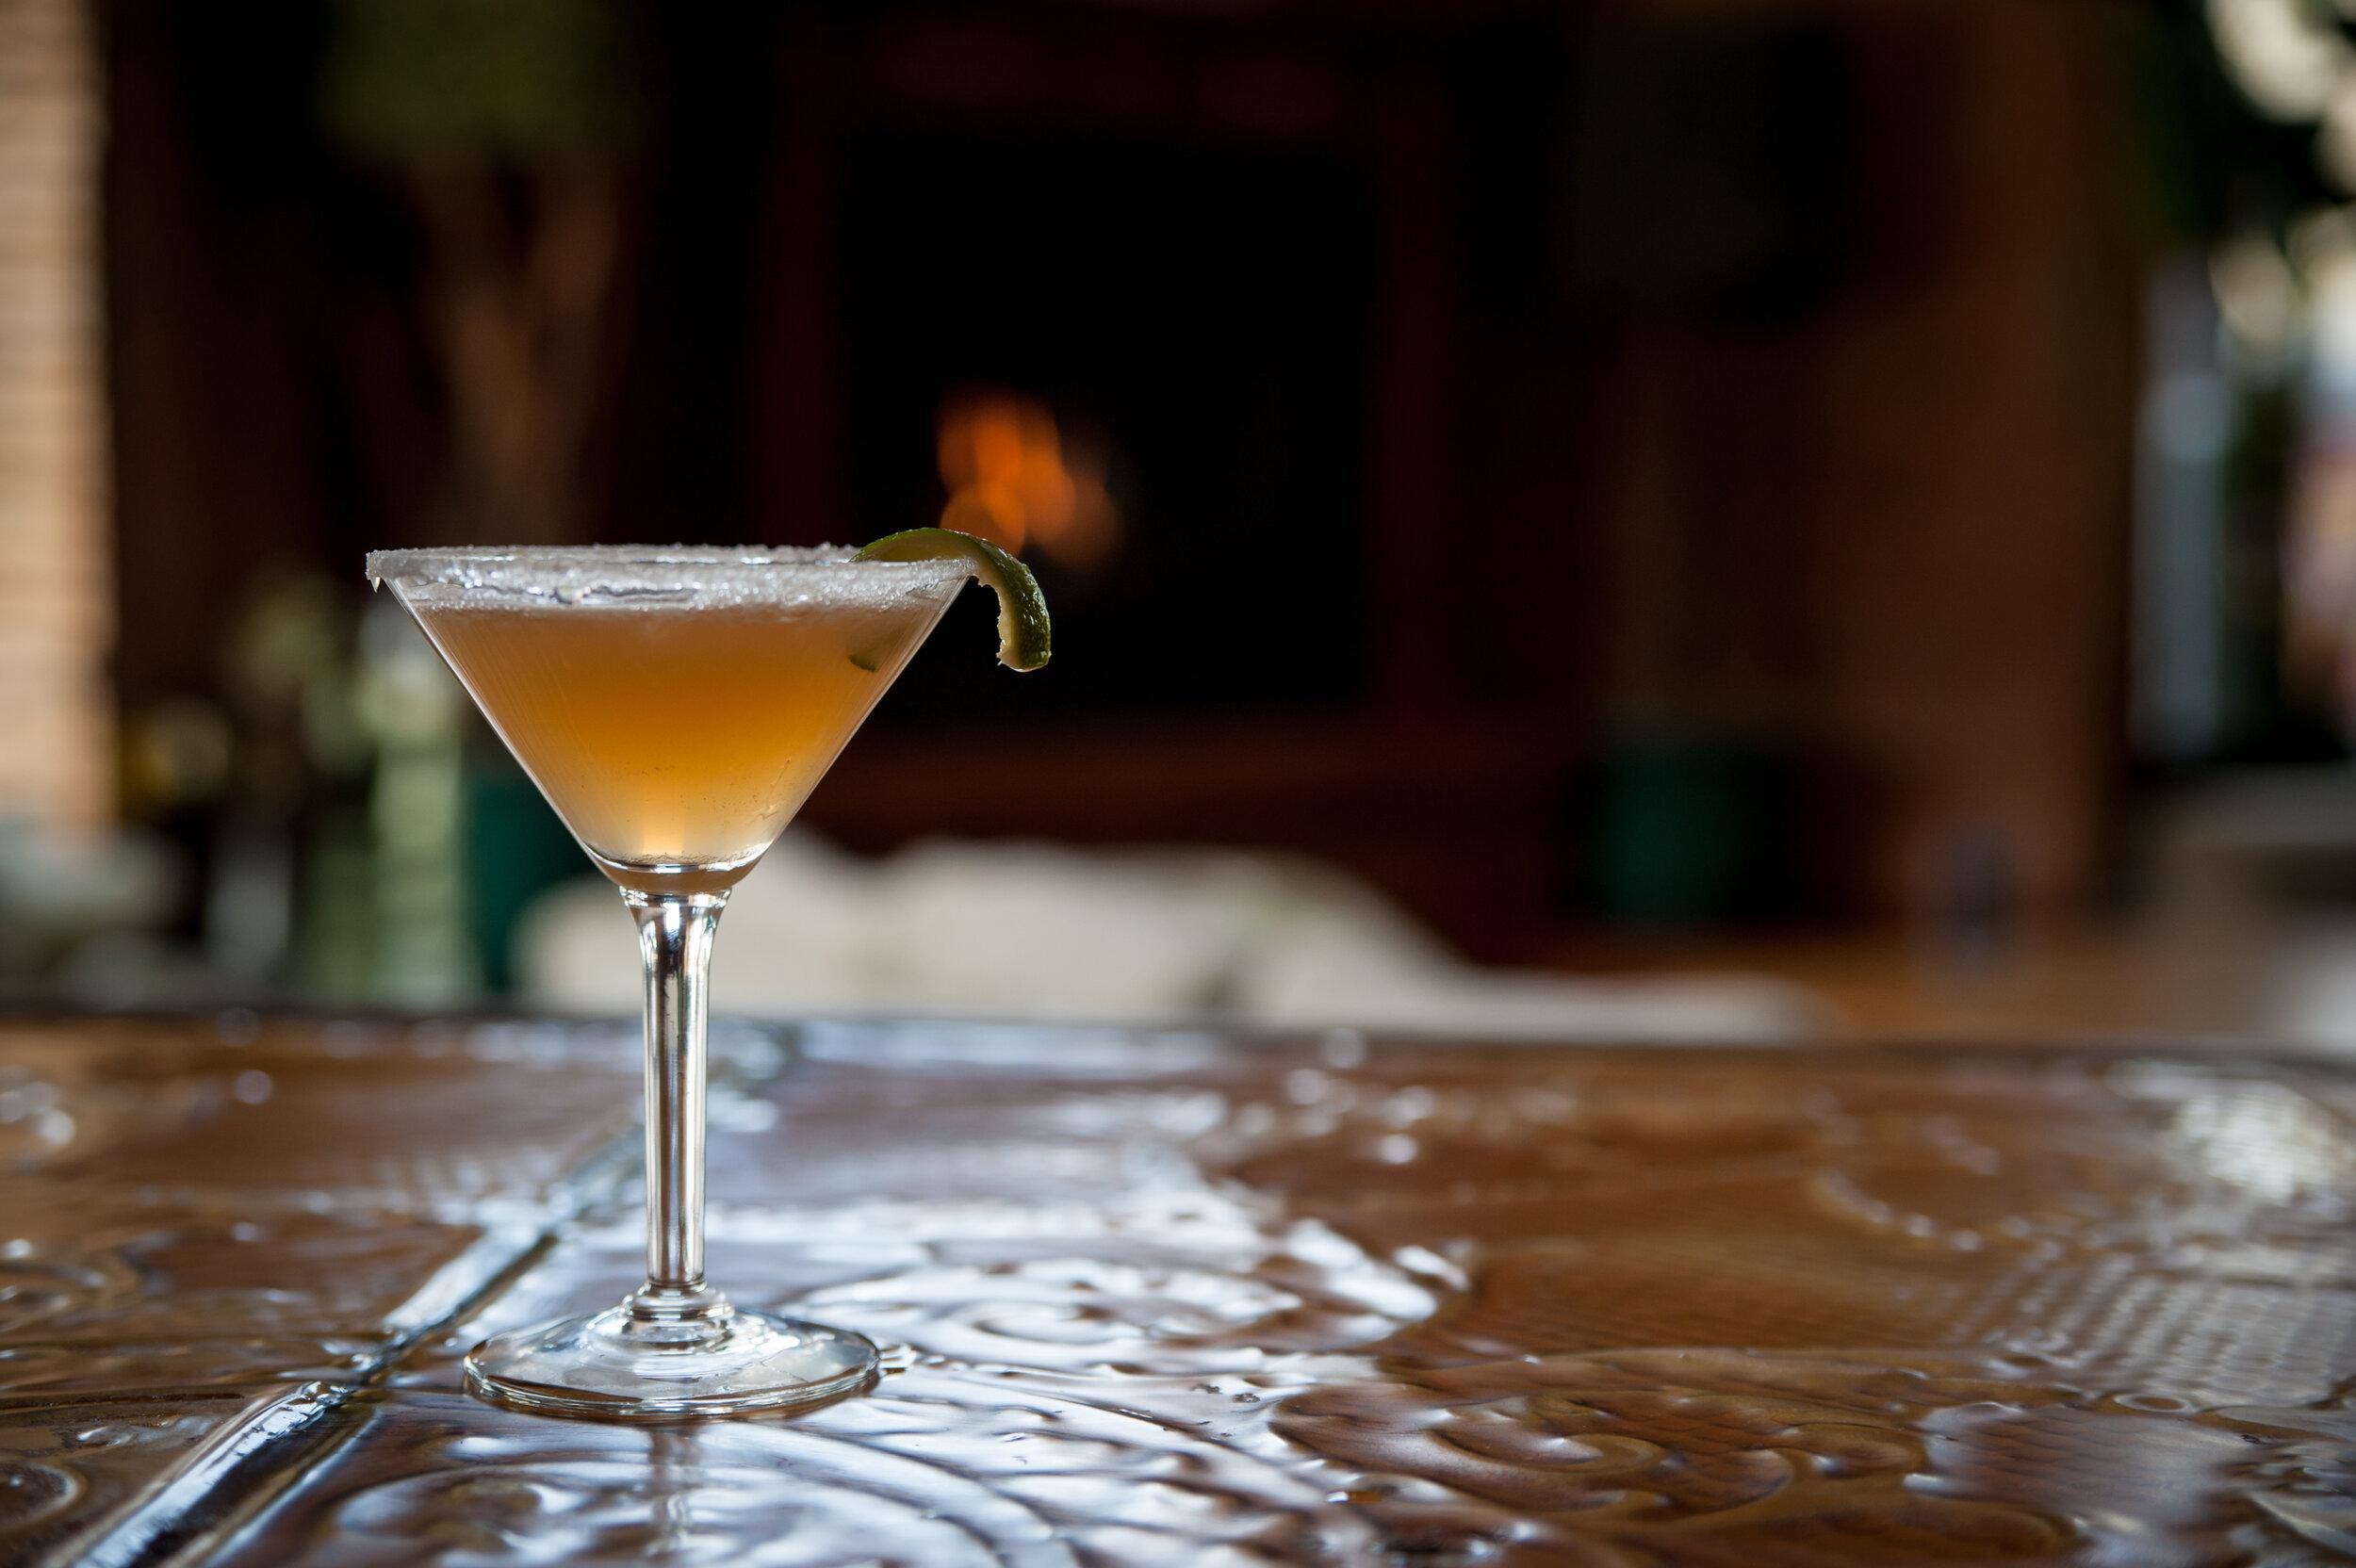 Between the sheets - 1 oz Courvoisier Cognac1 oz Whitecap rum1 oz lemon.5 oz Grand Marnier.5 oz simple syrupDash of orange bittersServe in a chilled martini glassSugar rim garnish